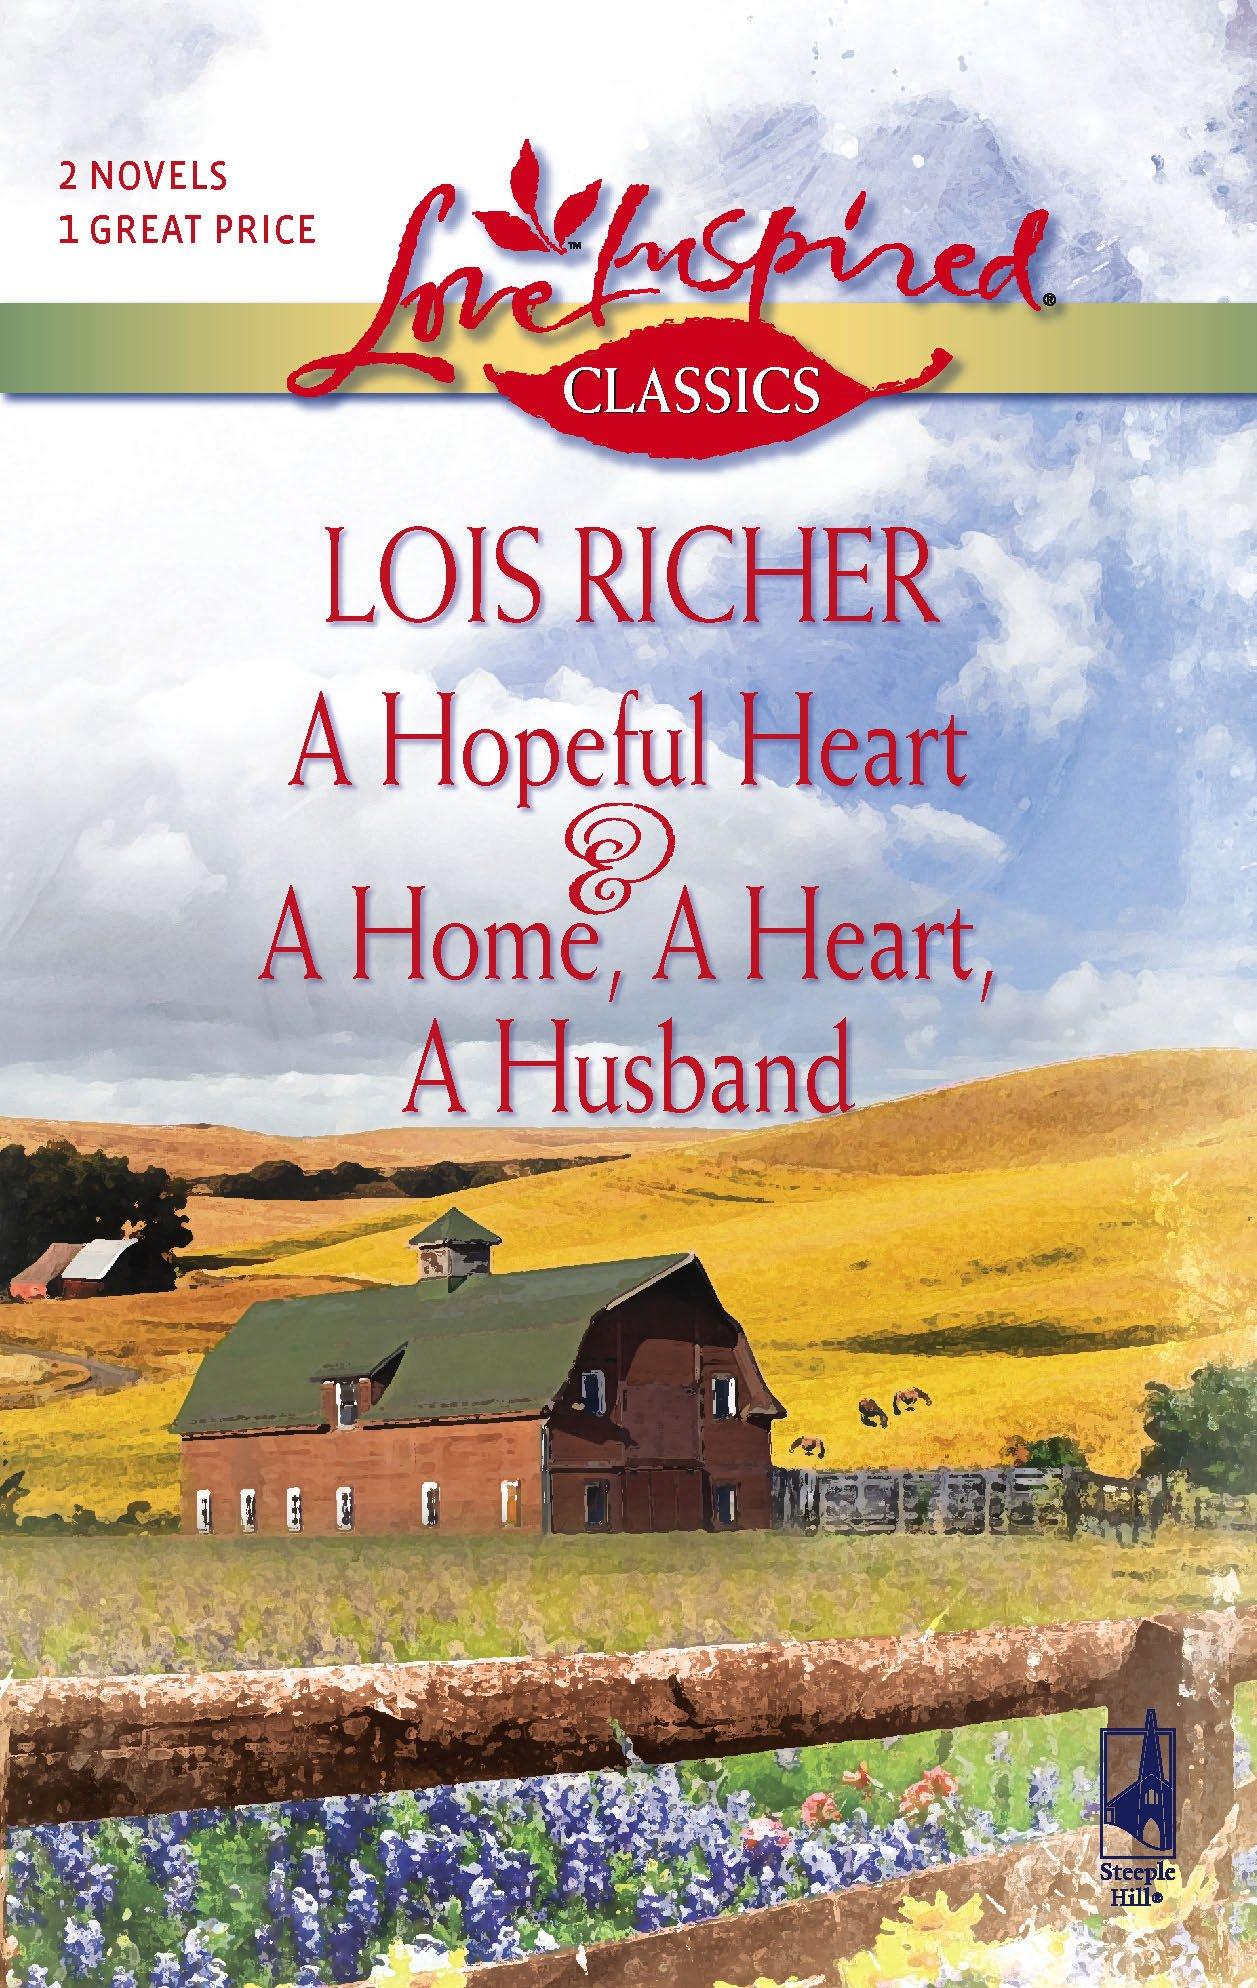 A Hopeful Heart/A Home, a Heart, a Husband (Love Inspired Classics) ePub fb2 book